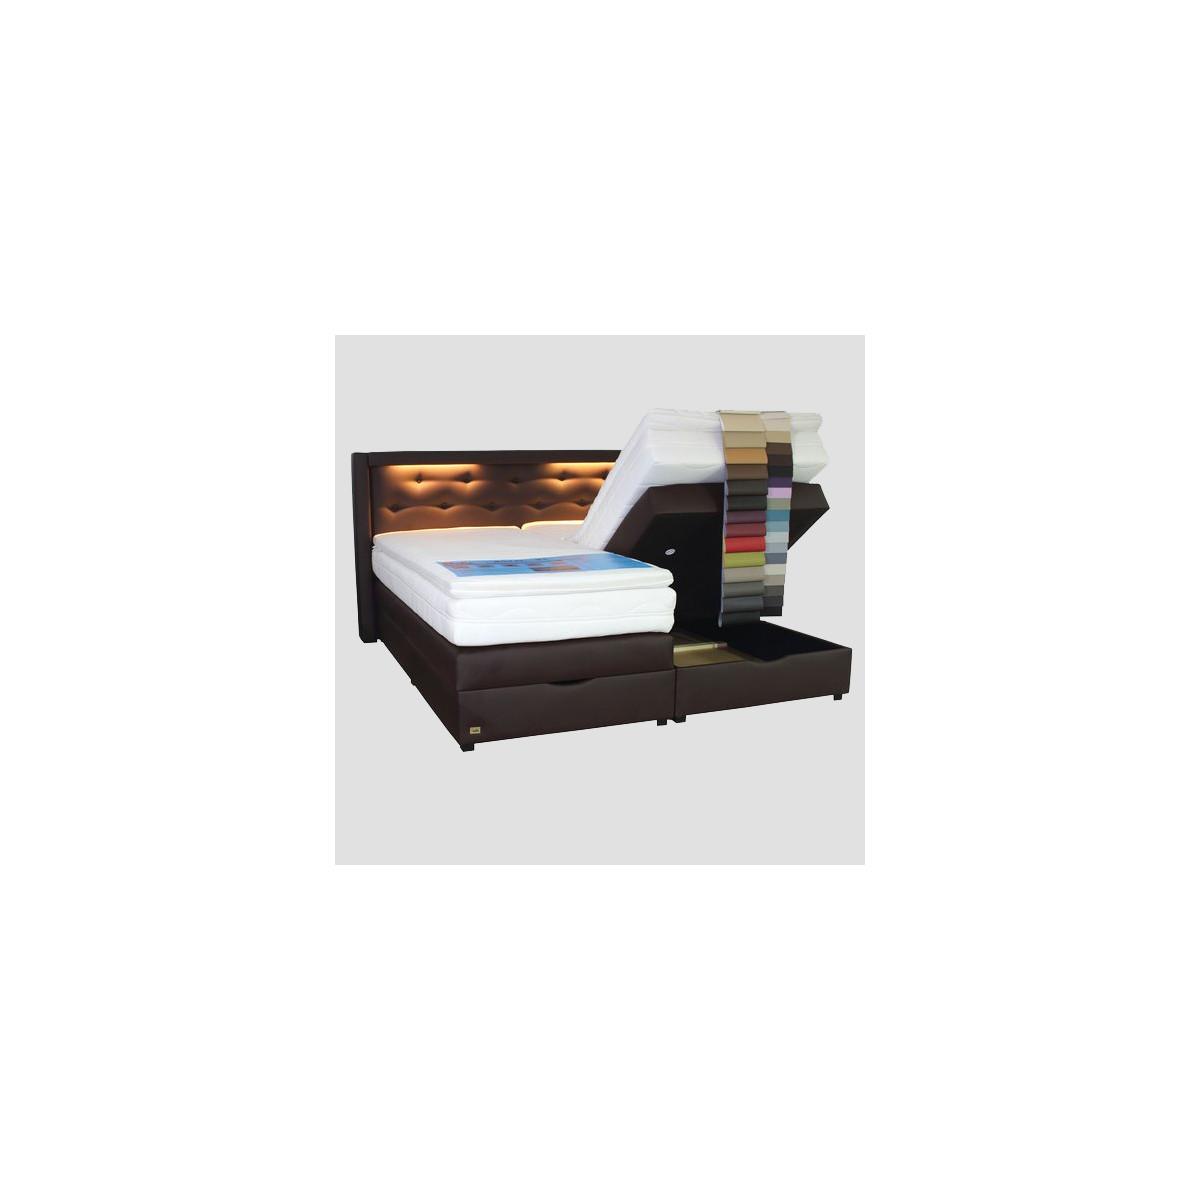 Boxspringbett  PAARA Schlafsysteme - Werksverkauf - Bett Fertigung nach Maß